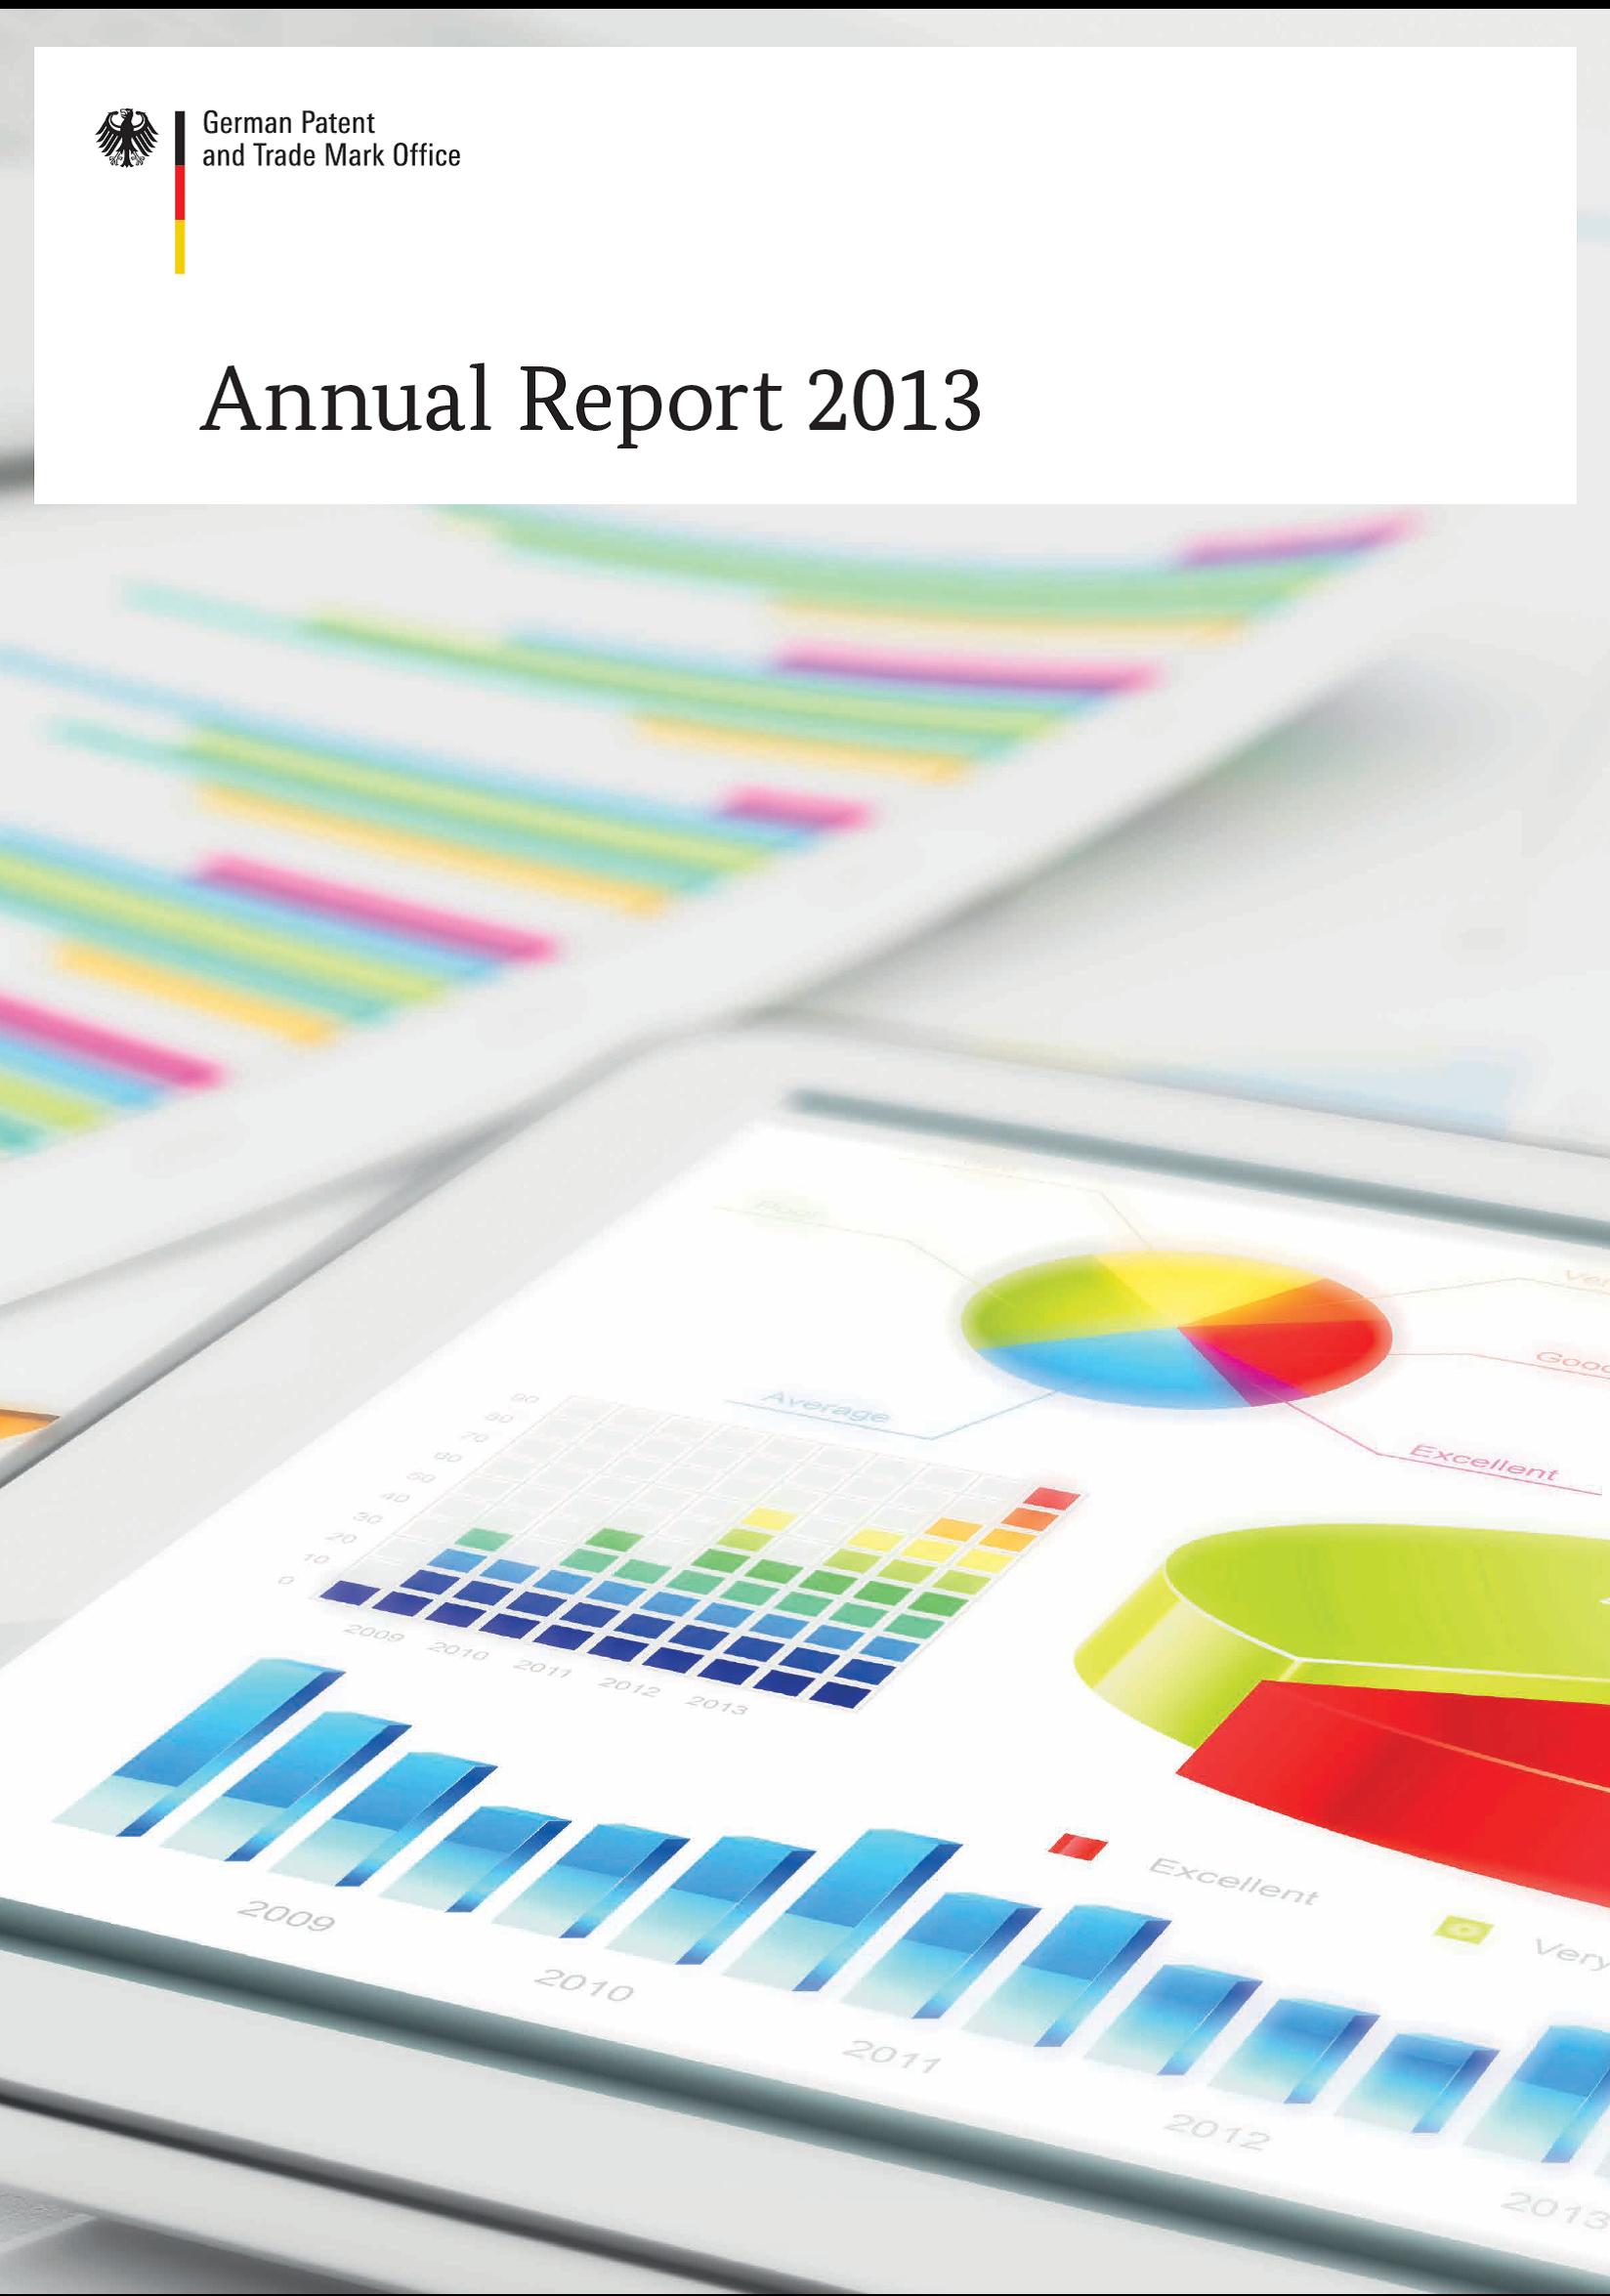 GPTO: Annual Report 2013 | LexDellmeier – Markenanwalt, Designanwalt ...